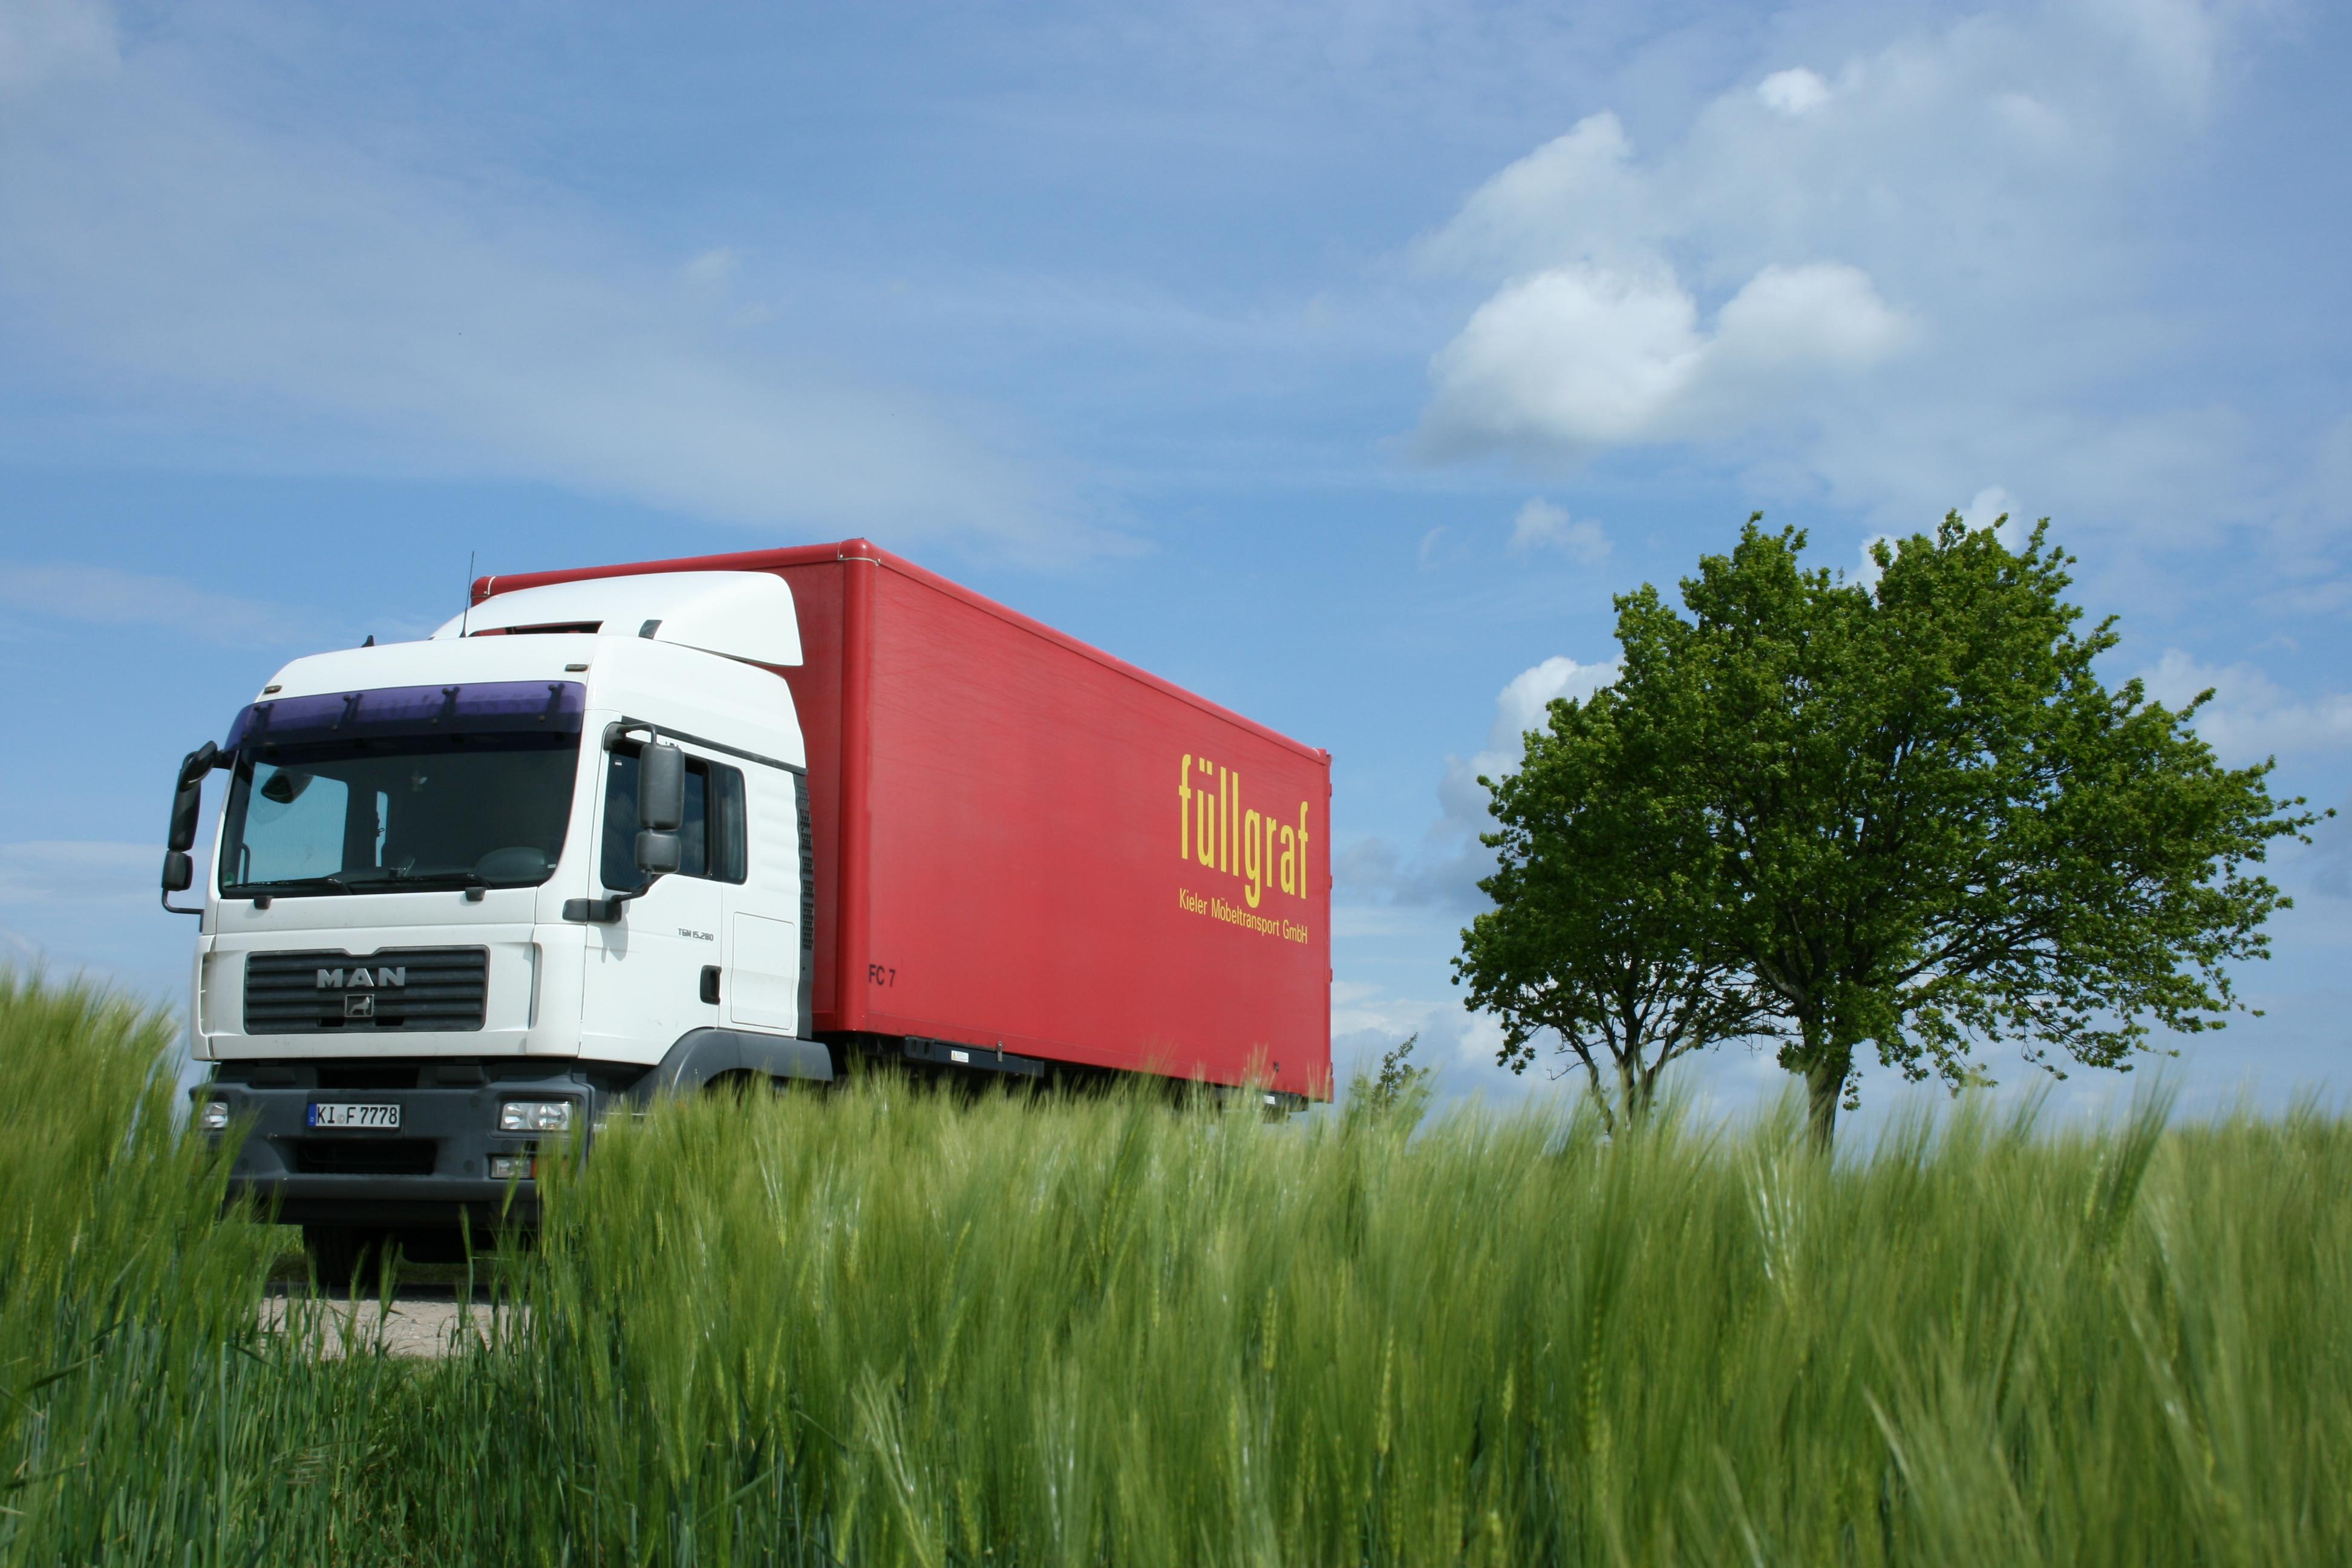 Logistik Transport Werbefotografie Roadtrip LKW Umzugsunternehmen Schleswig-Holstein Landschaft Kornfeld